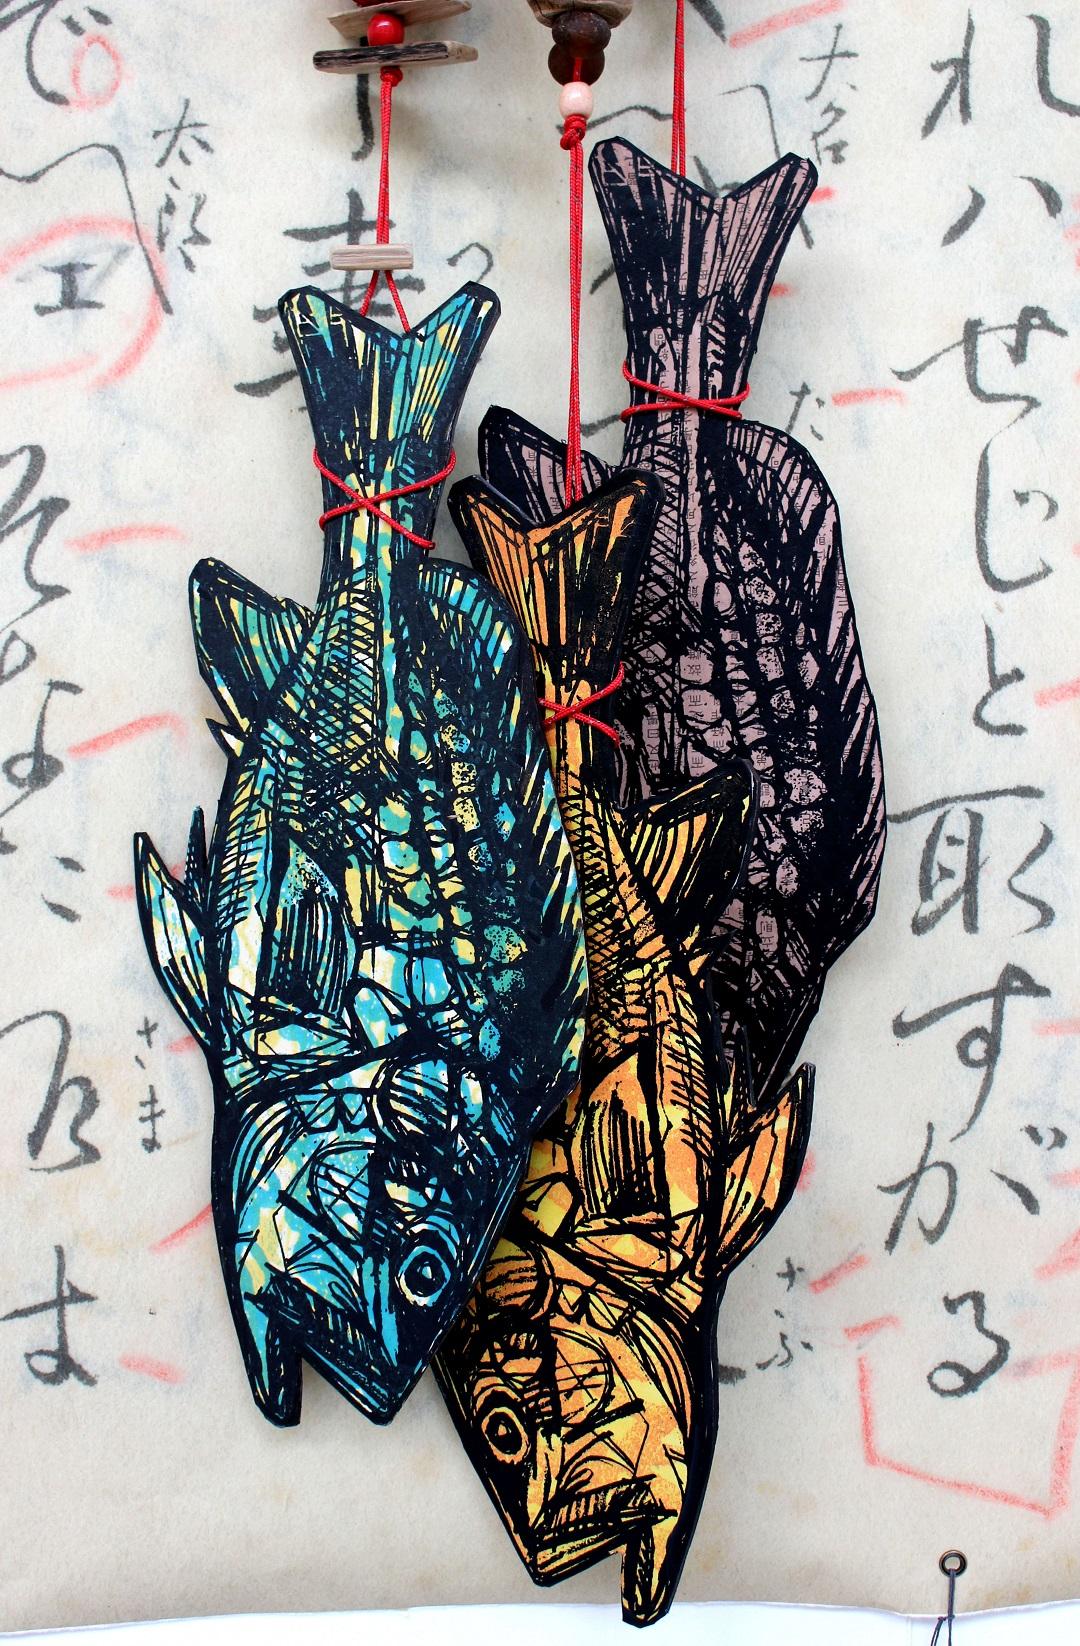 'Fishing For A Girl 2' Ian Burke Woodblock print and mixed media, 107cm x 180cm, 2019